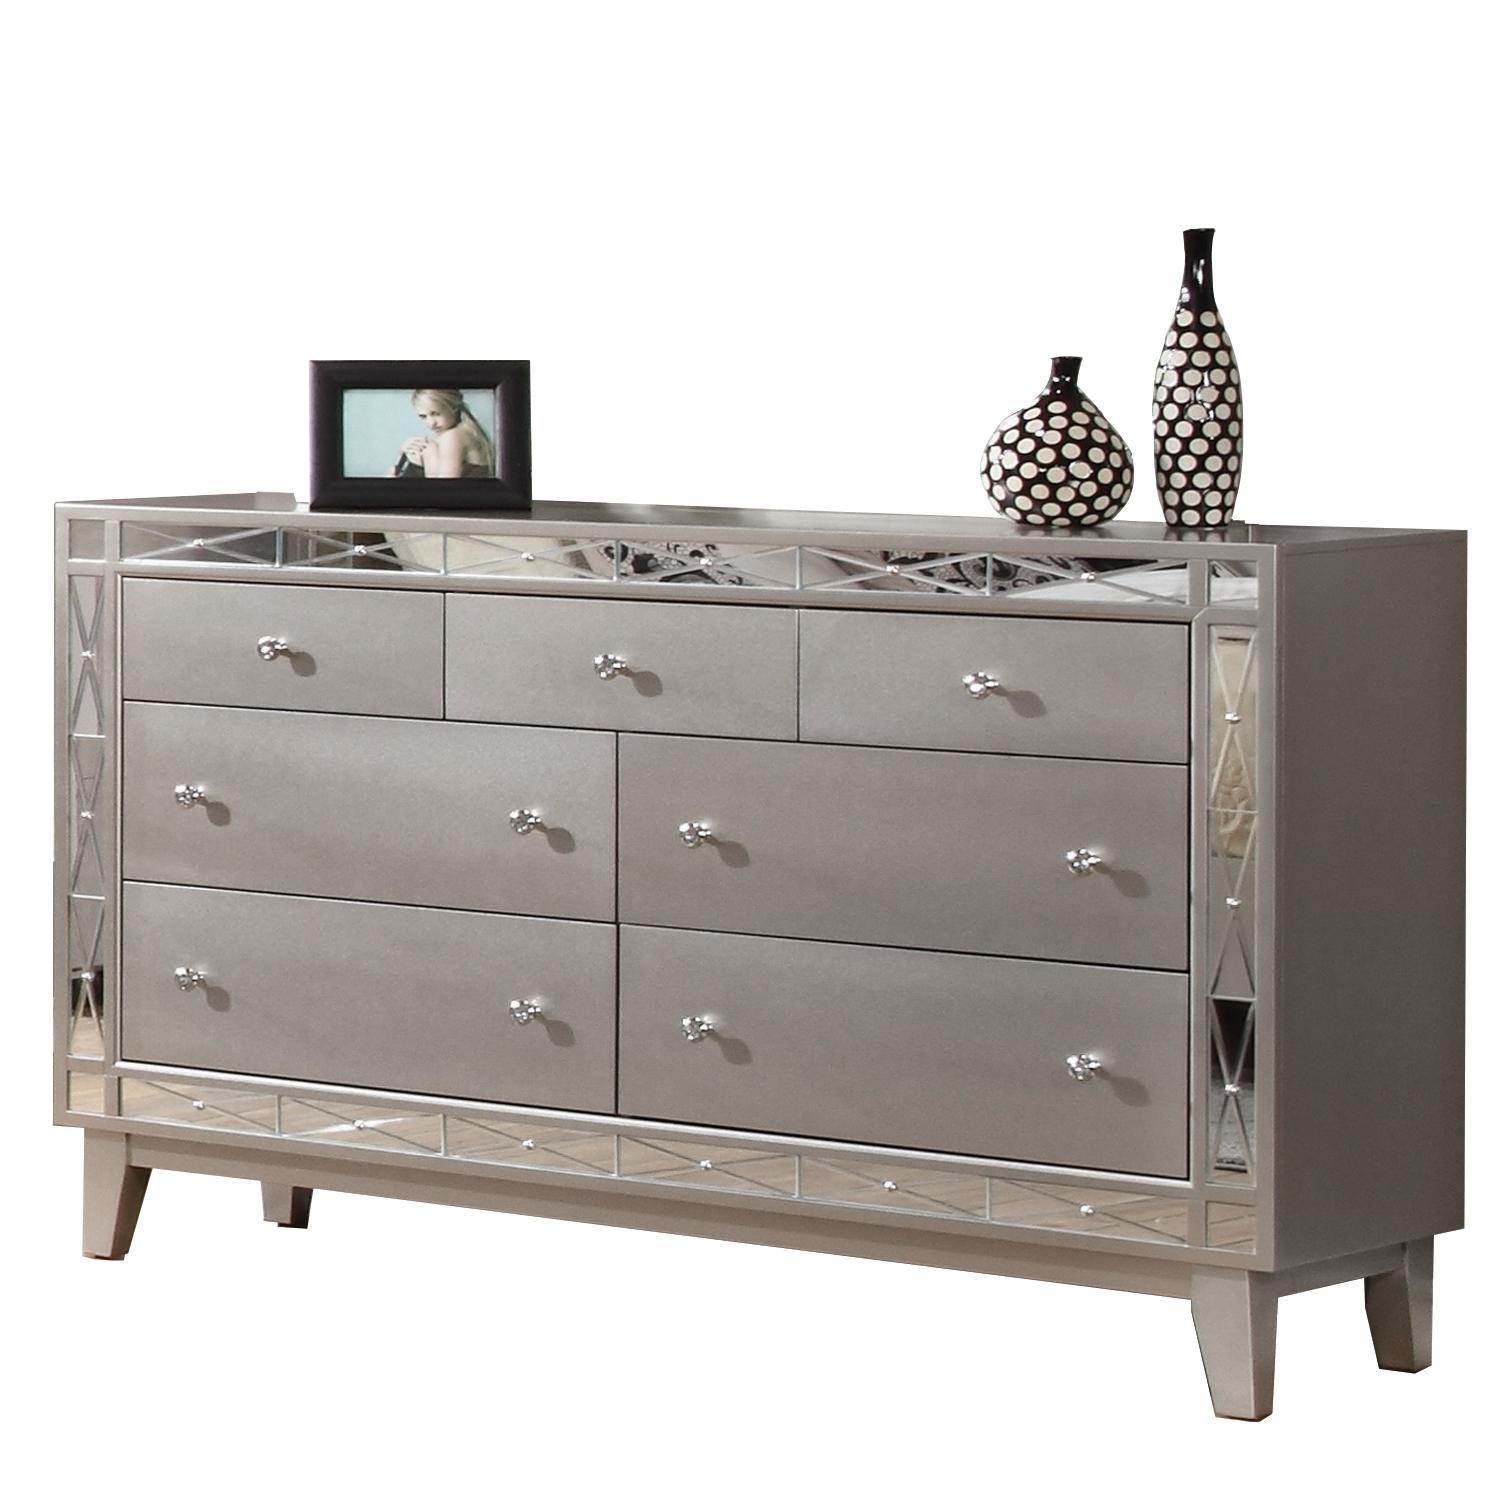 Coaster Company Leighton Dresser, Metallic Mercury